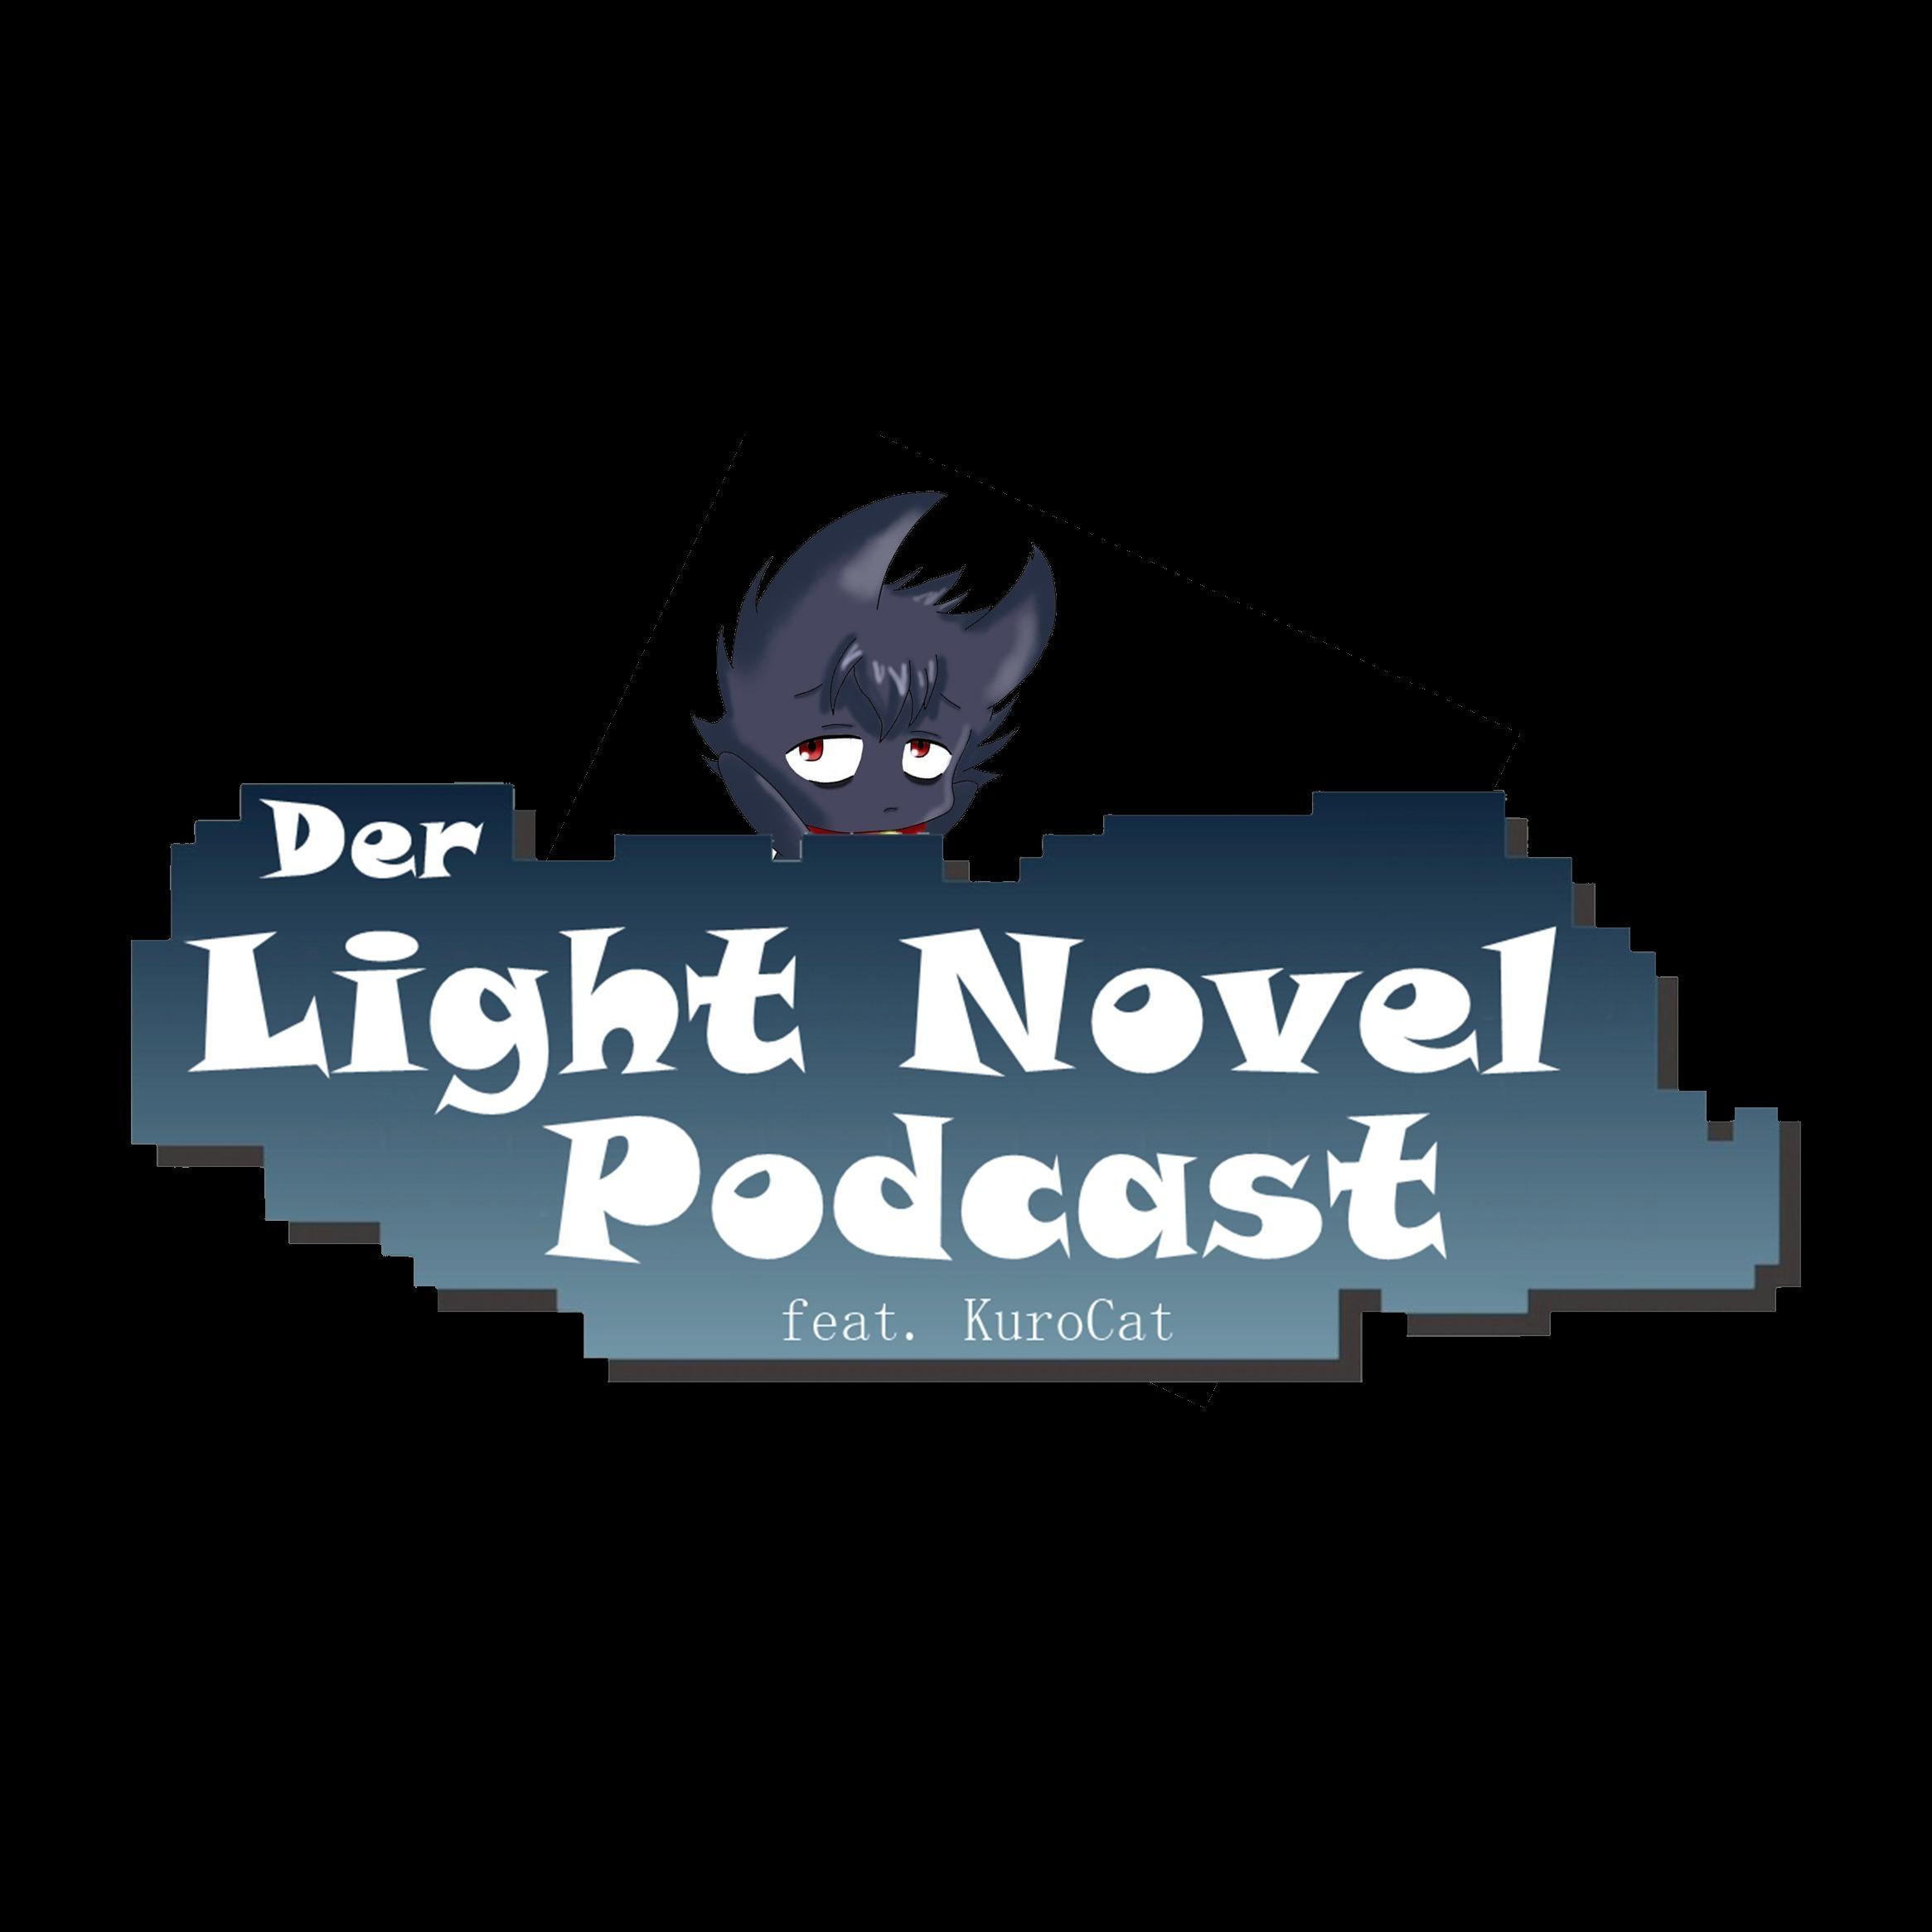 Der Light Novel Podcast #22 - Light Novel Expo Lizenzen und mehr